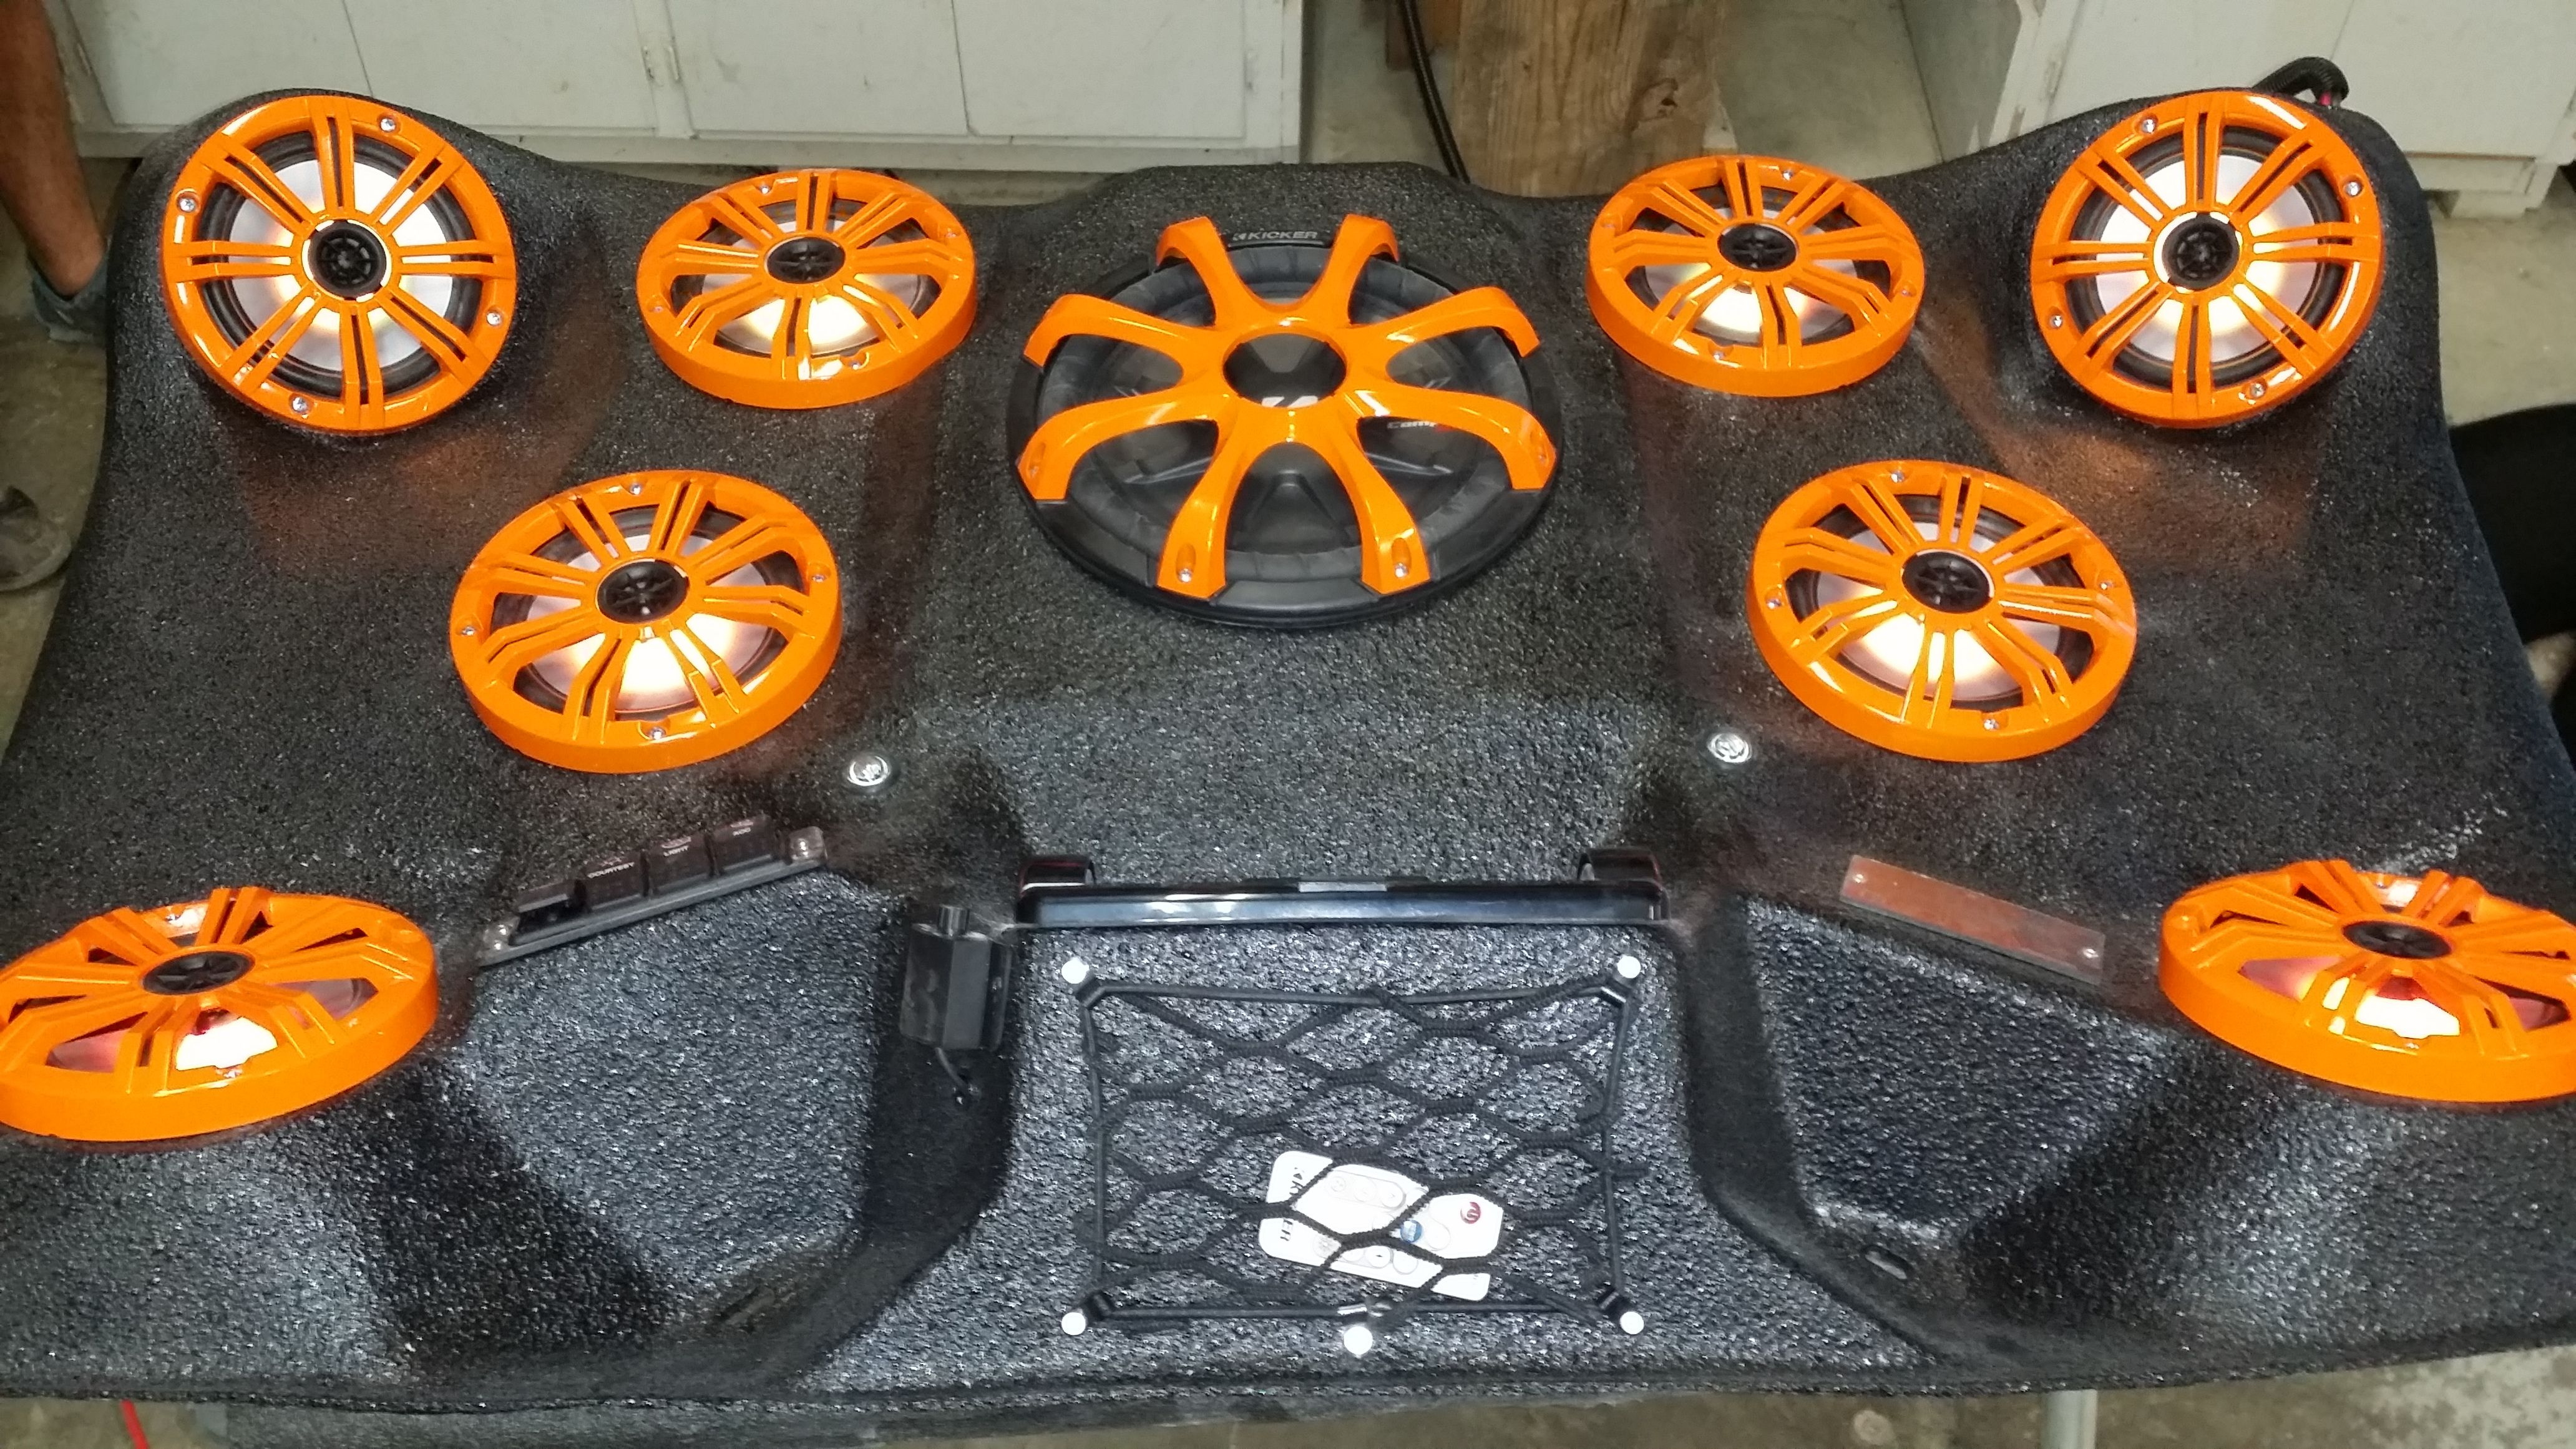 Mayhem Manufacturing Polaris 900 Audio Roof 8 6 5 Kicker Marine And 1 10 Kicker Subwoofer Find Us On Facebook And Kicker Subwoofer Fish Finders Polaris 900